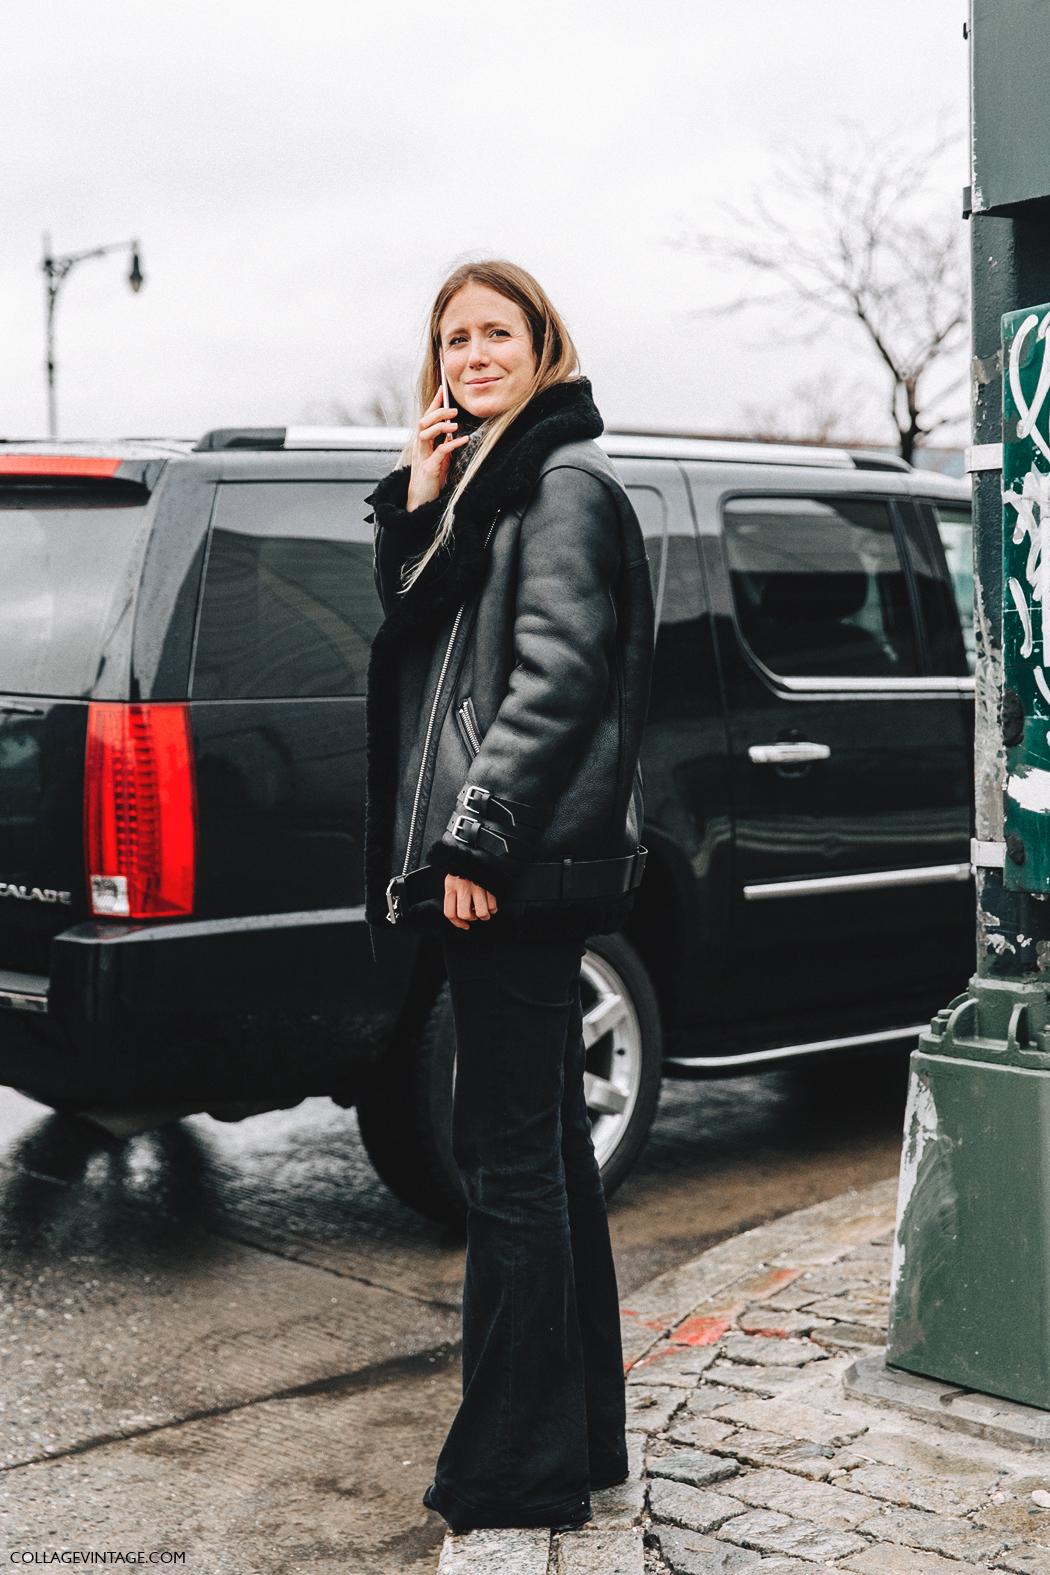 NYFW-New_York_Fashion_Week-Fall_Winter-17-Street_Style-Jennifer_Neyt-Acne_Coat-